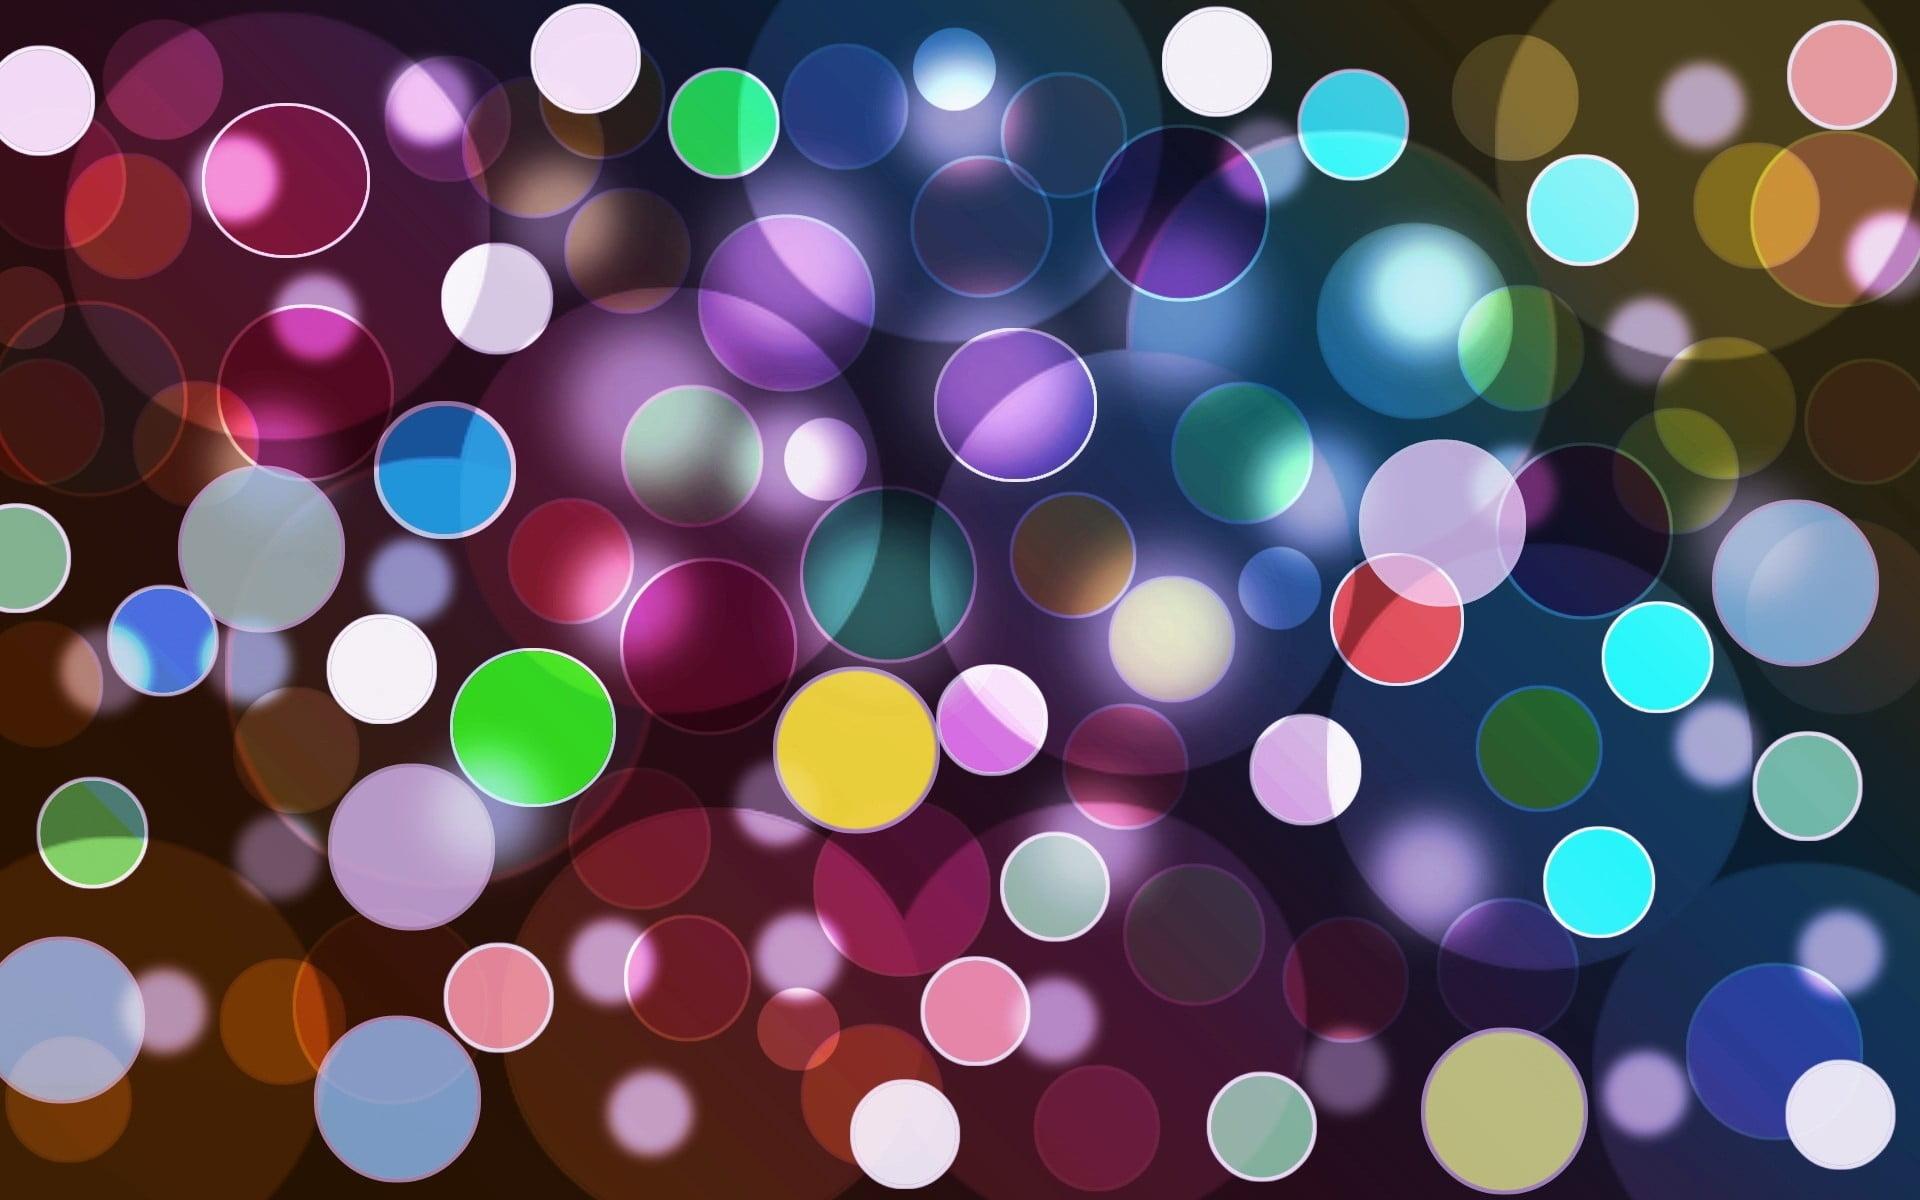 Colorful Bubbles Wallpaper Hd - HD Wallpaper